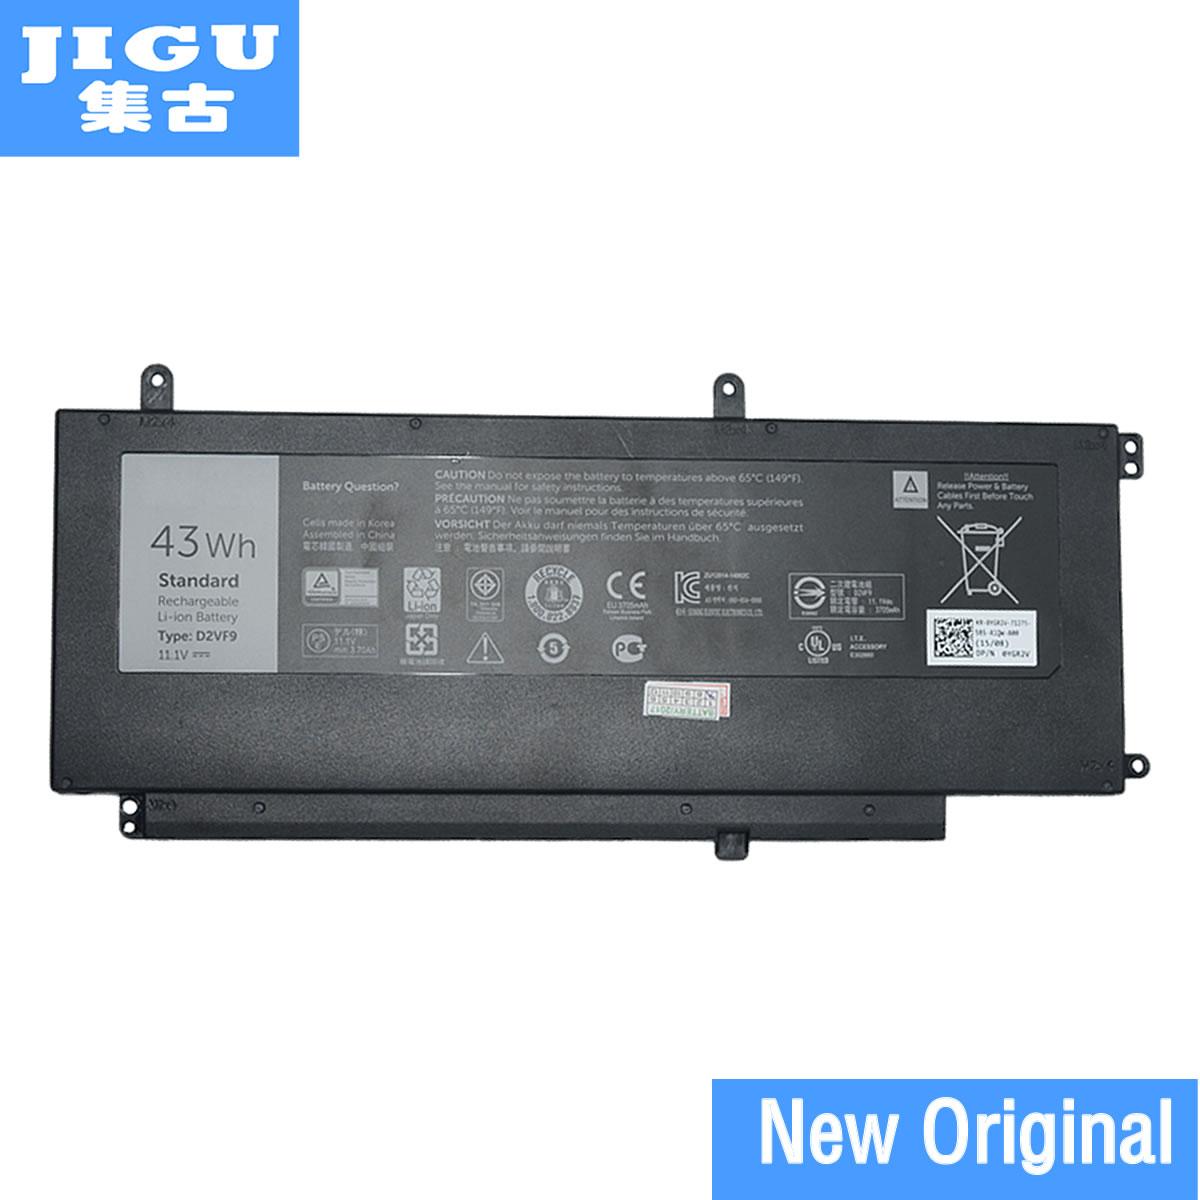 JGIU Original Laptop Battery 0PXR51 0YGR2V D2VF9 PXR51 For DELL For Inspiron 15 7547 7548 For Vostro 14 5000 5459